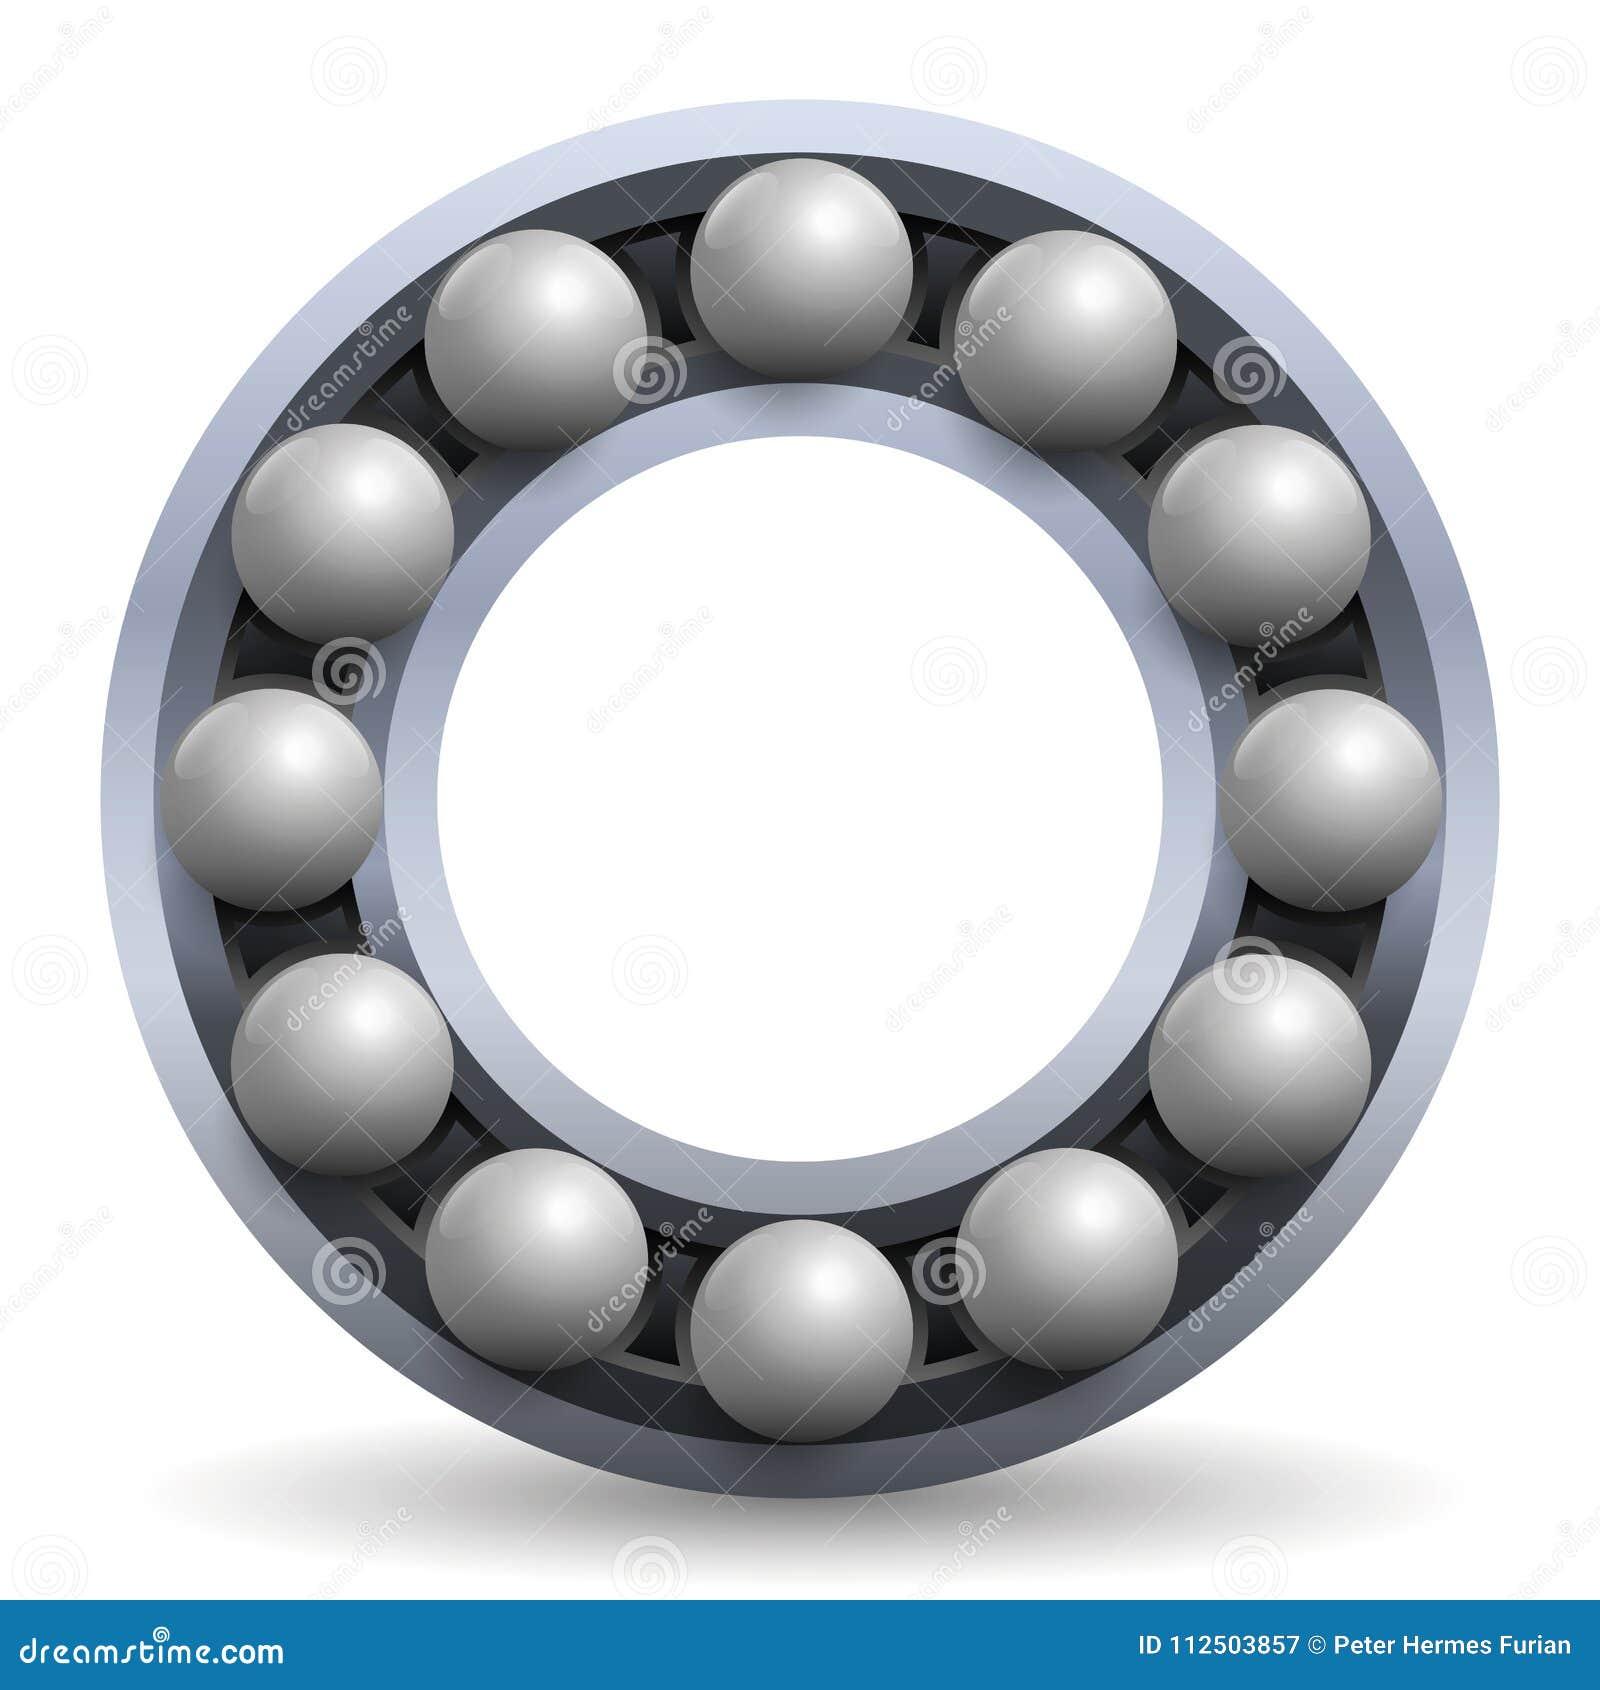 rolling-bearing-iron-balls-metal-wheel-schematic -model-illustration-mechanical-technical-engineering-item-isolated-vector-112503857.jpg